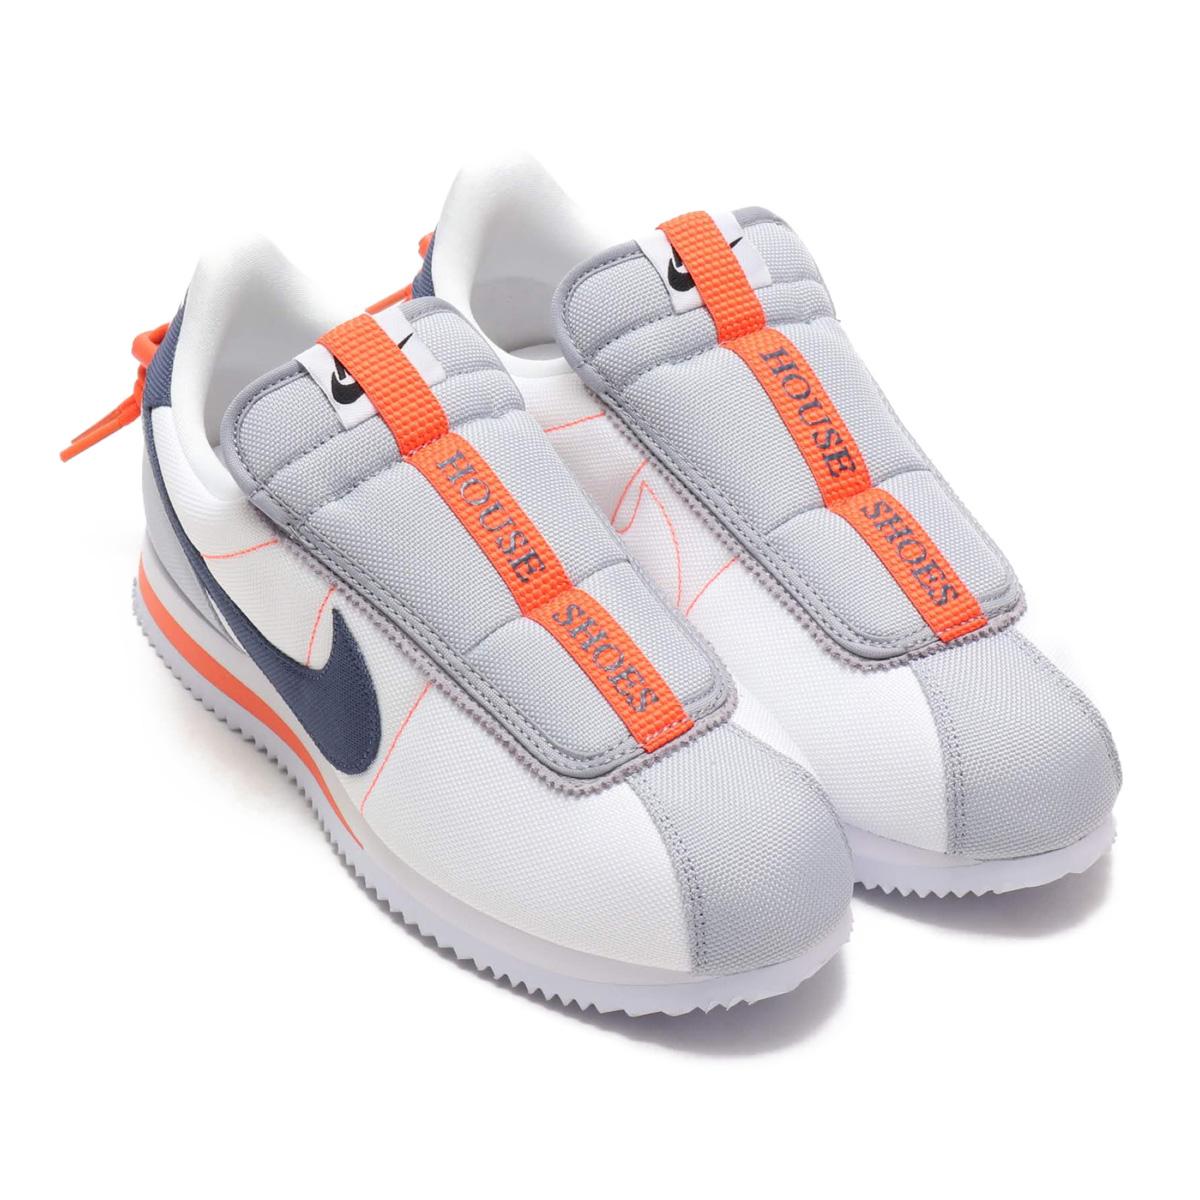 sports shoes c24a6 8420c spain nike cortez orange grey 7690a 35b76